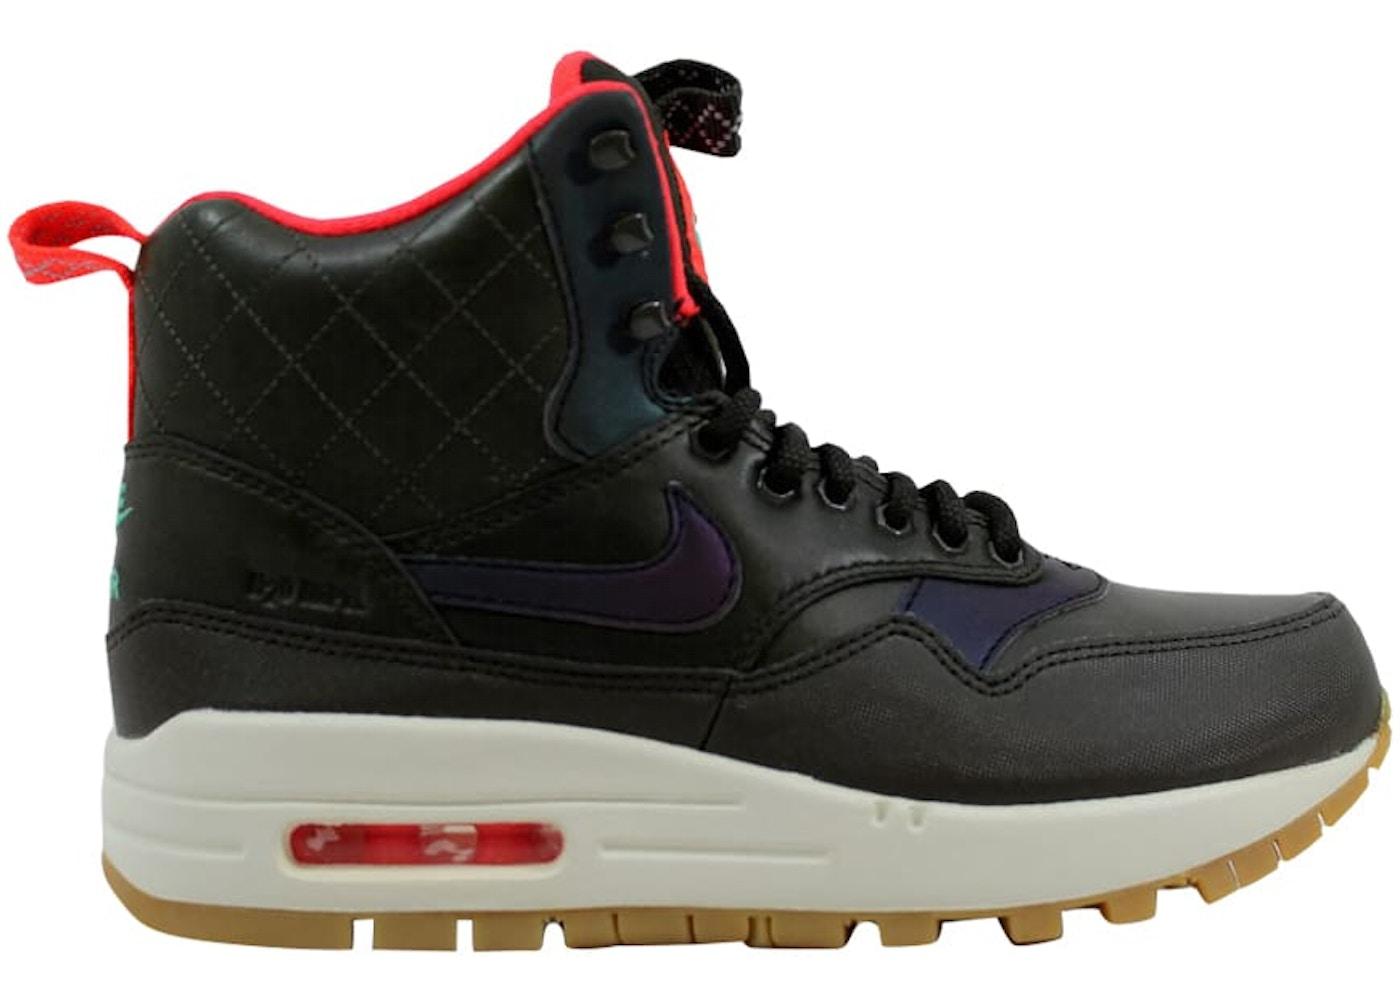 localizar embargo no usado  Nike Air Max 1 Mid Sneakerboot Reflect Sequoia/Black-Bright Crimson-Mint  (W) - 807307-300